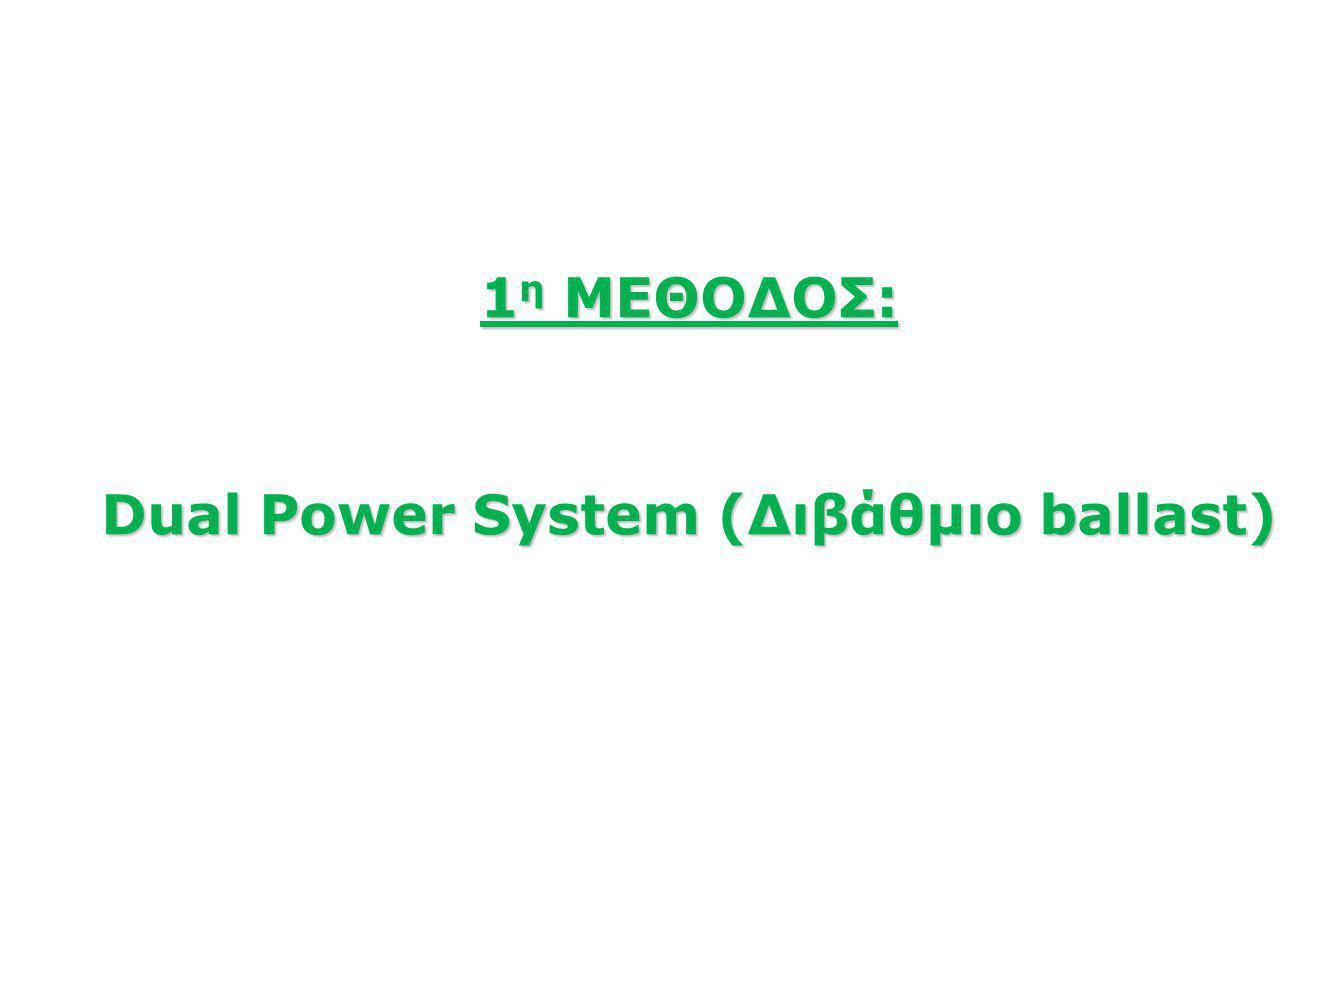 Dual Power System (Διβάθμιo ballast)